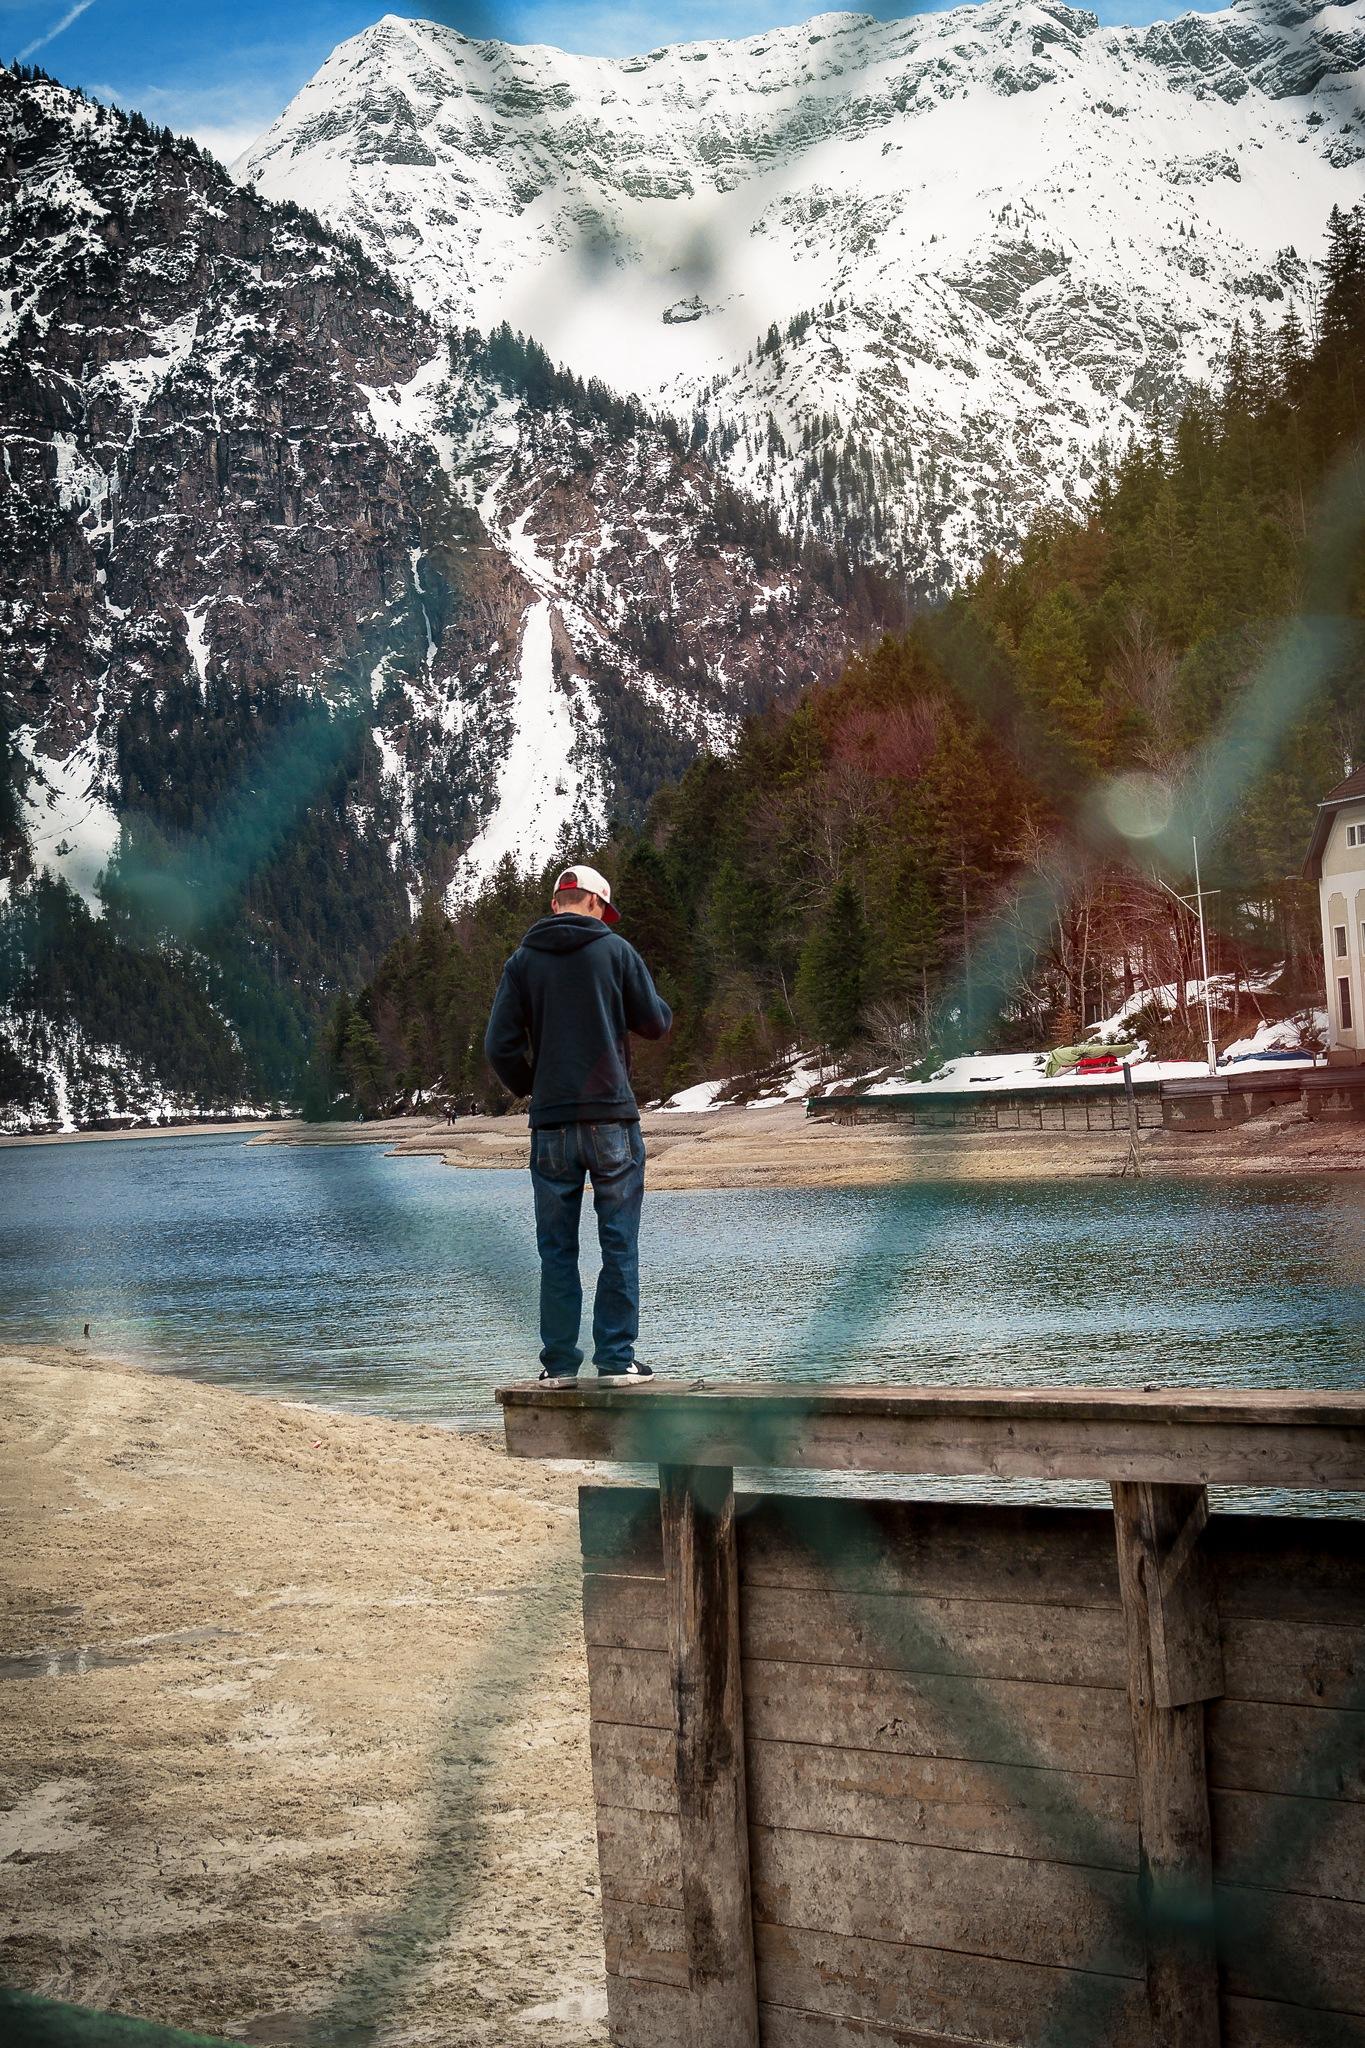 plansee tirol austria by face_visual